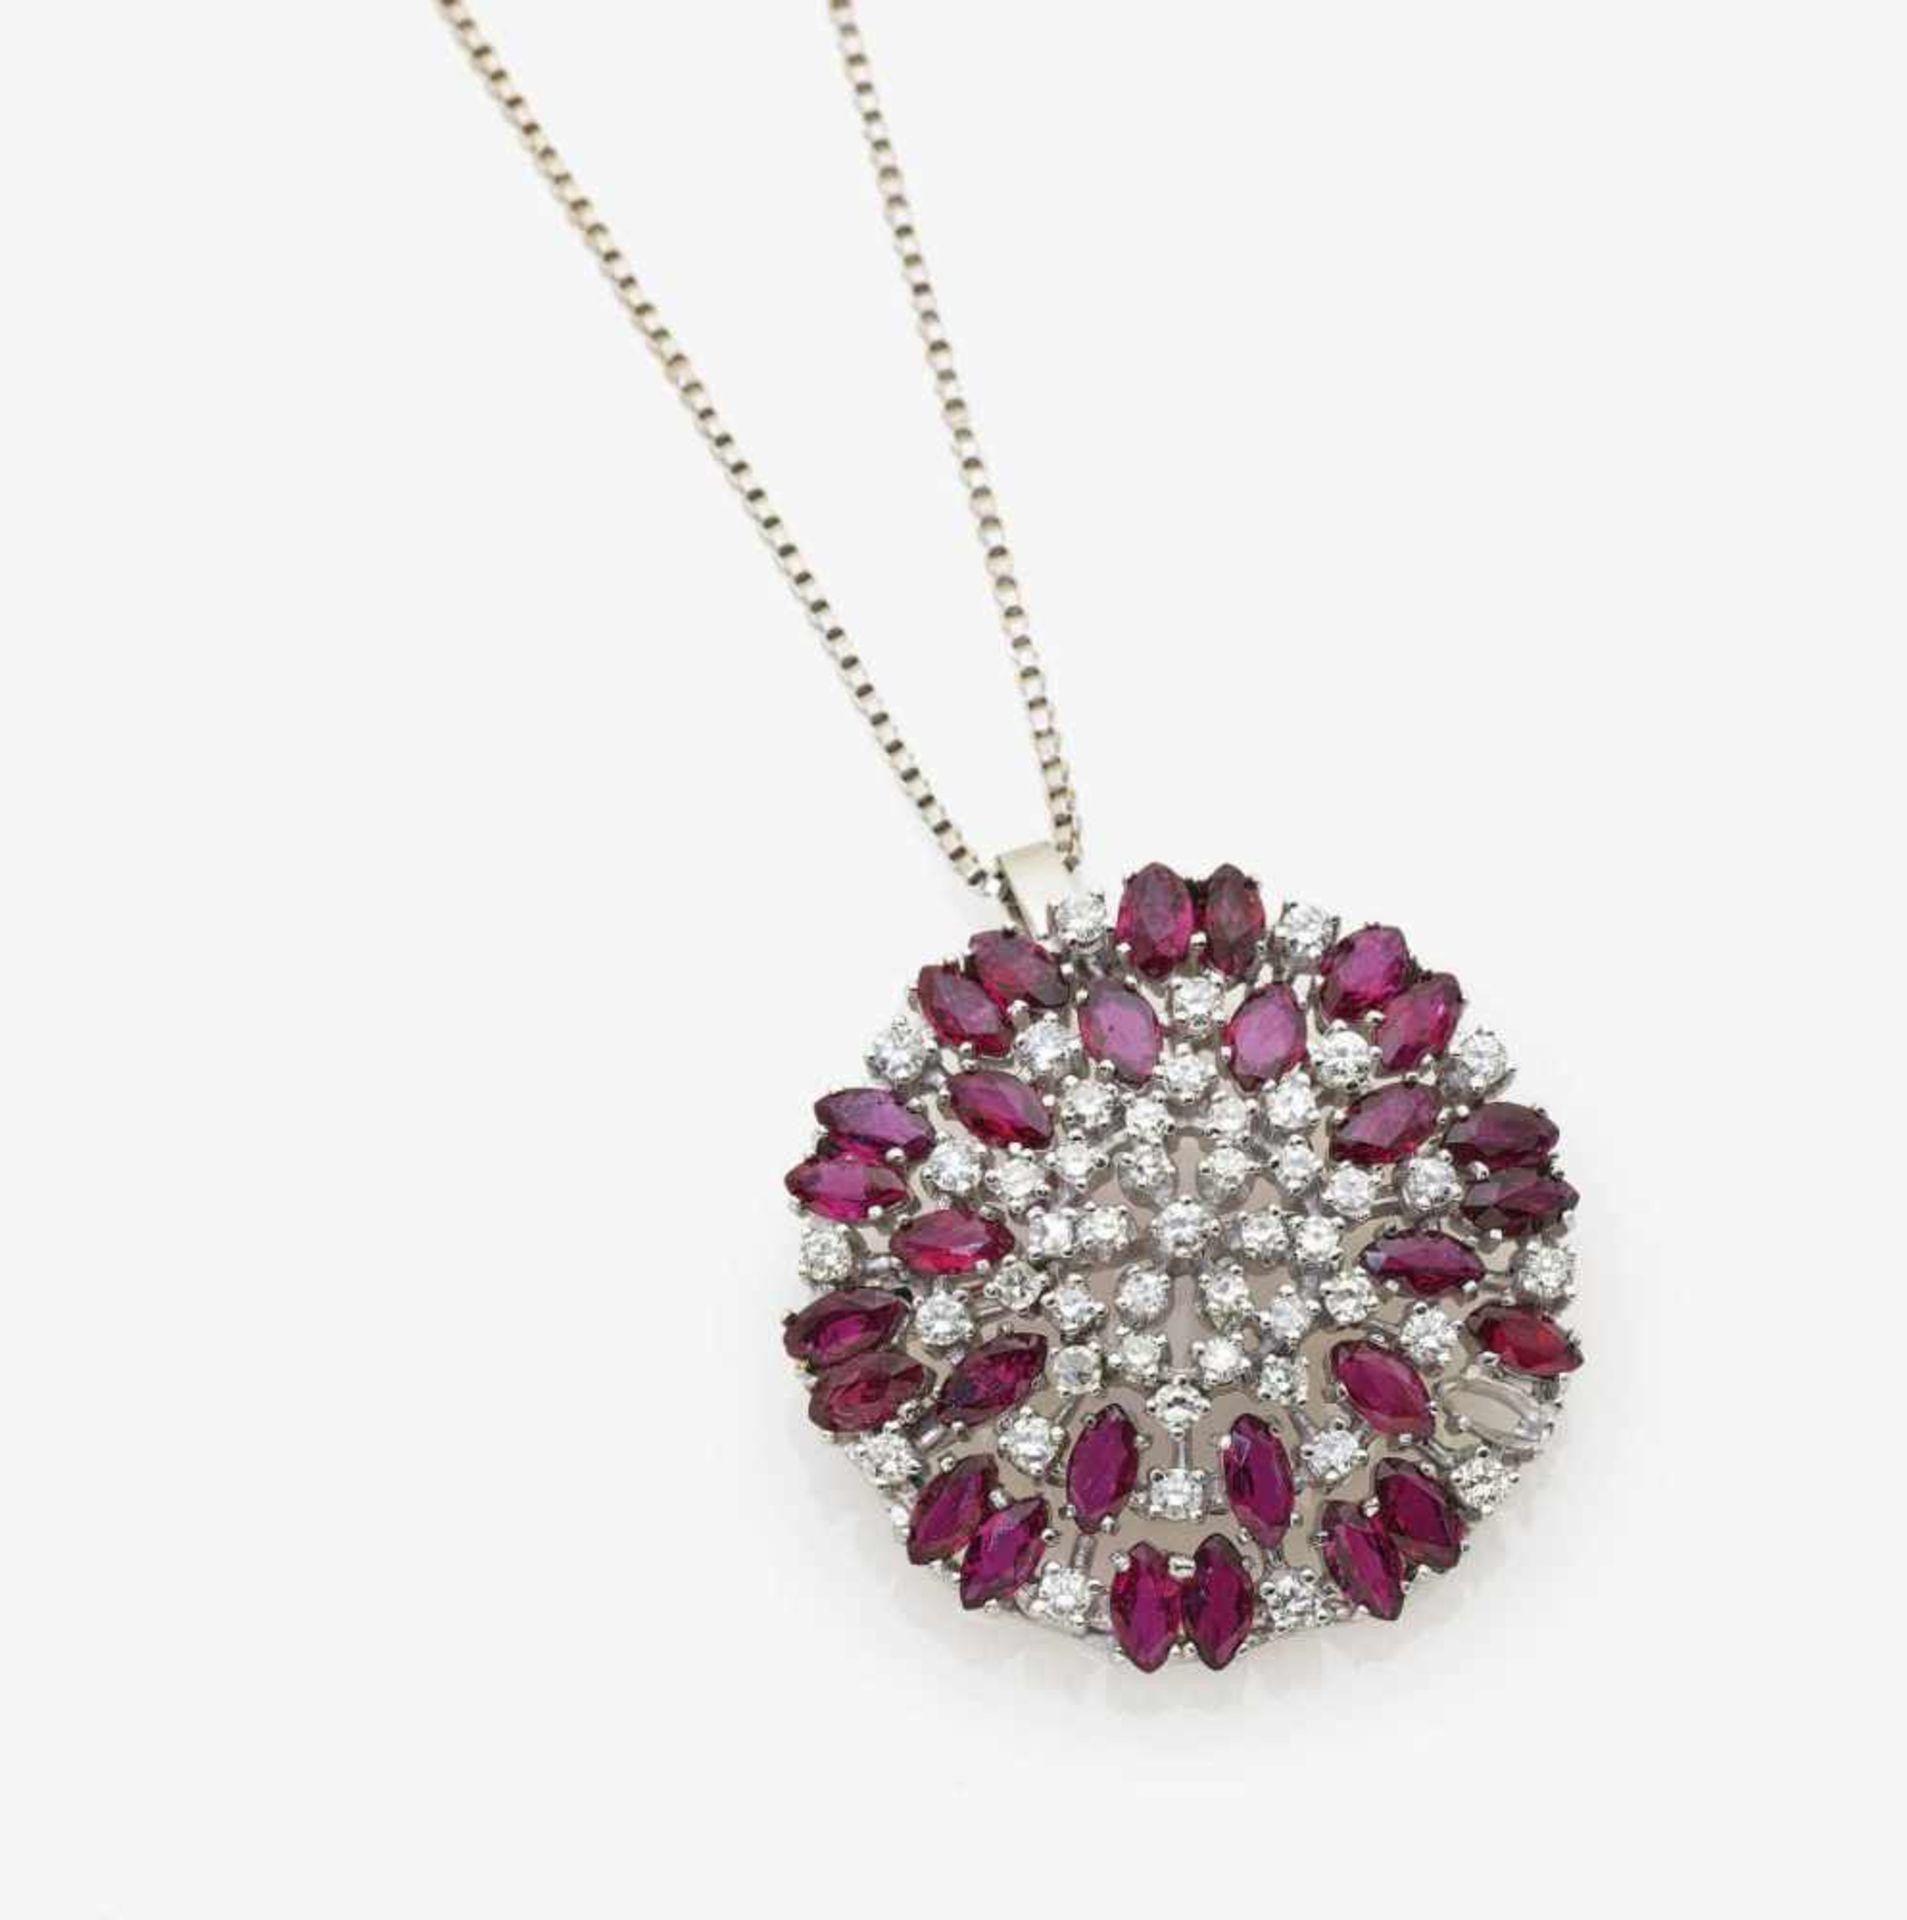 Los 1039 - A Diamond and Ruby Pendant